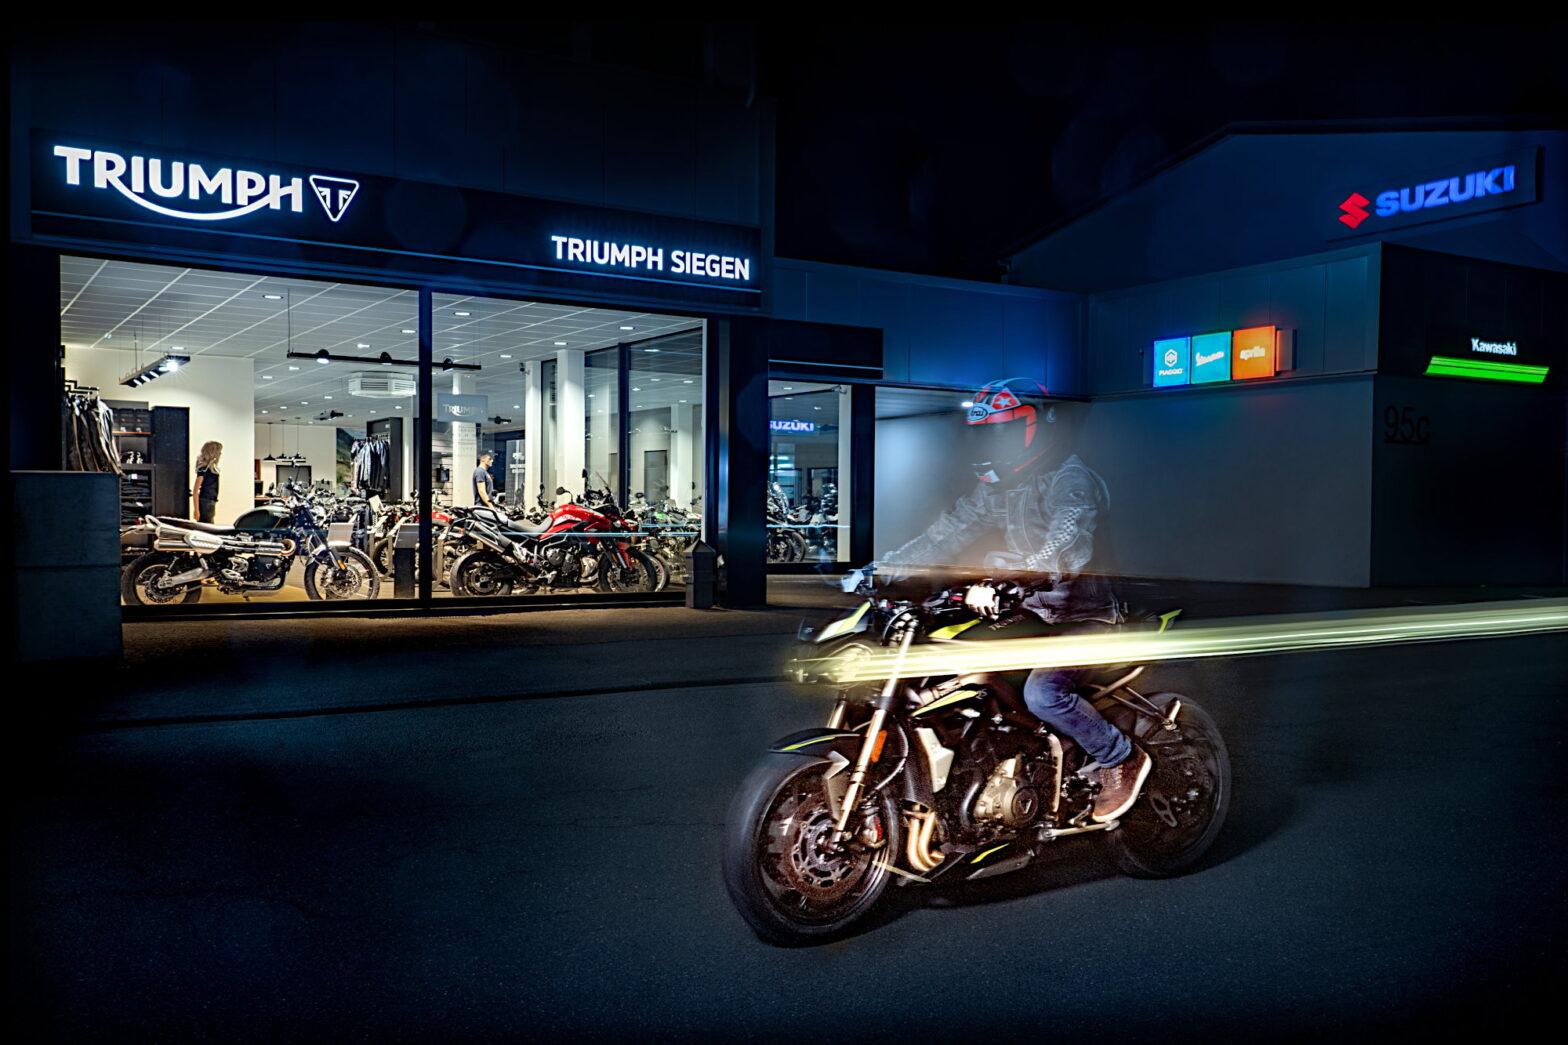 Motorradhändler in Siegen